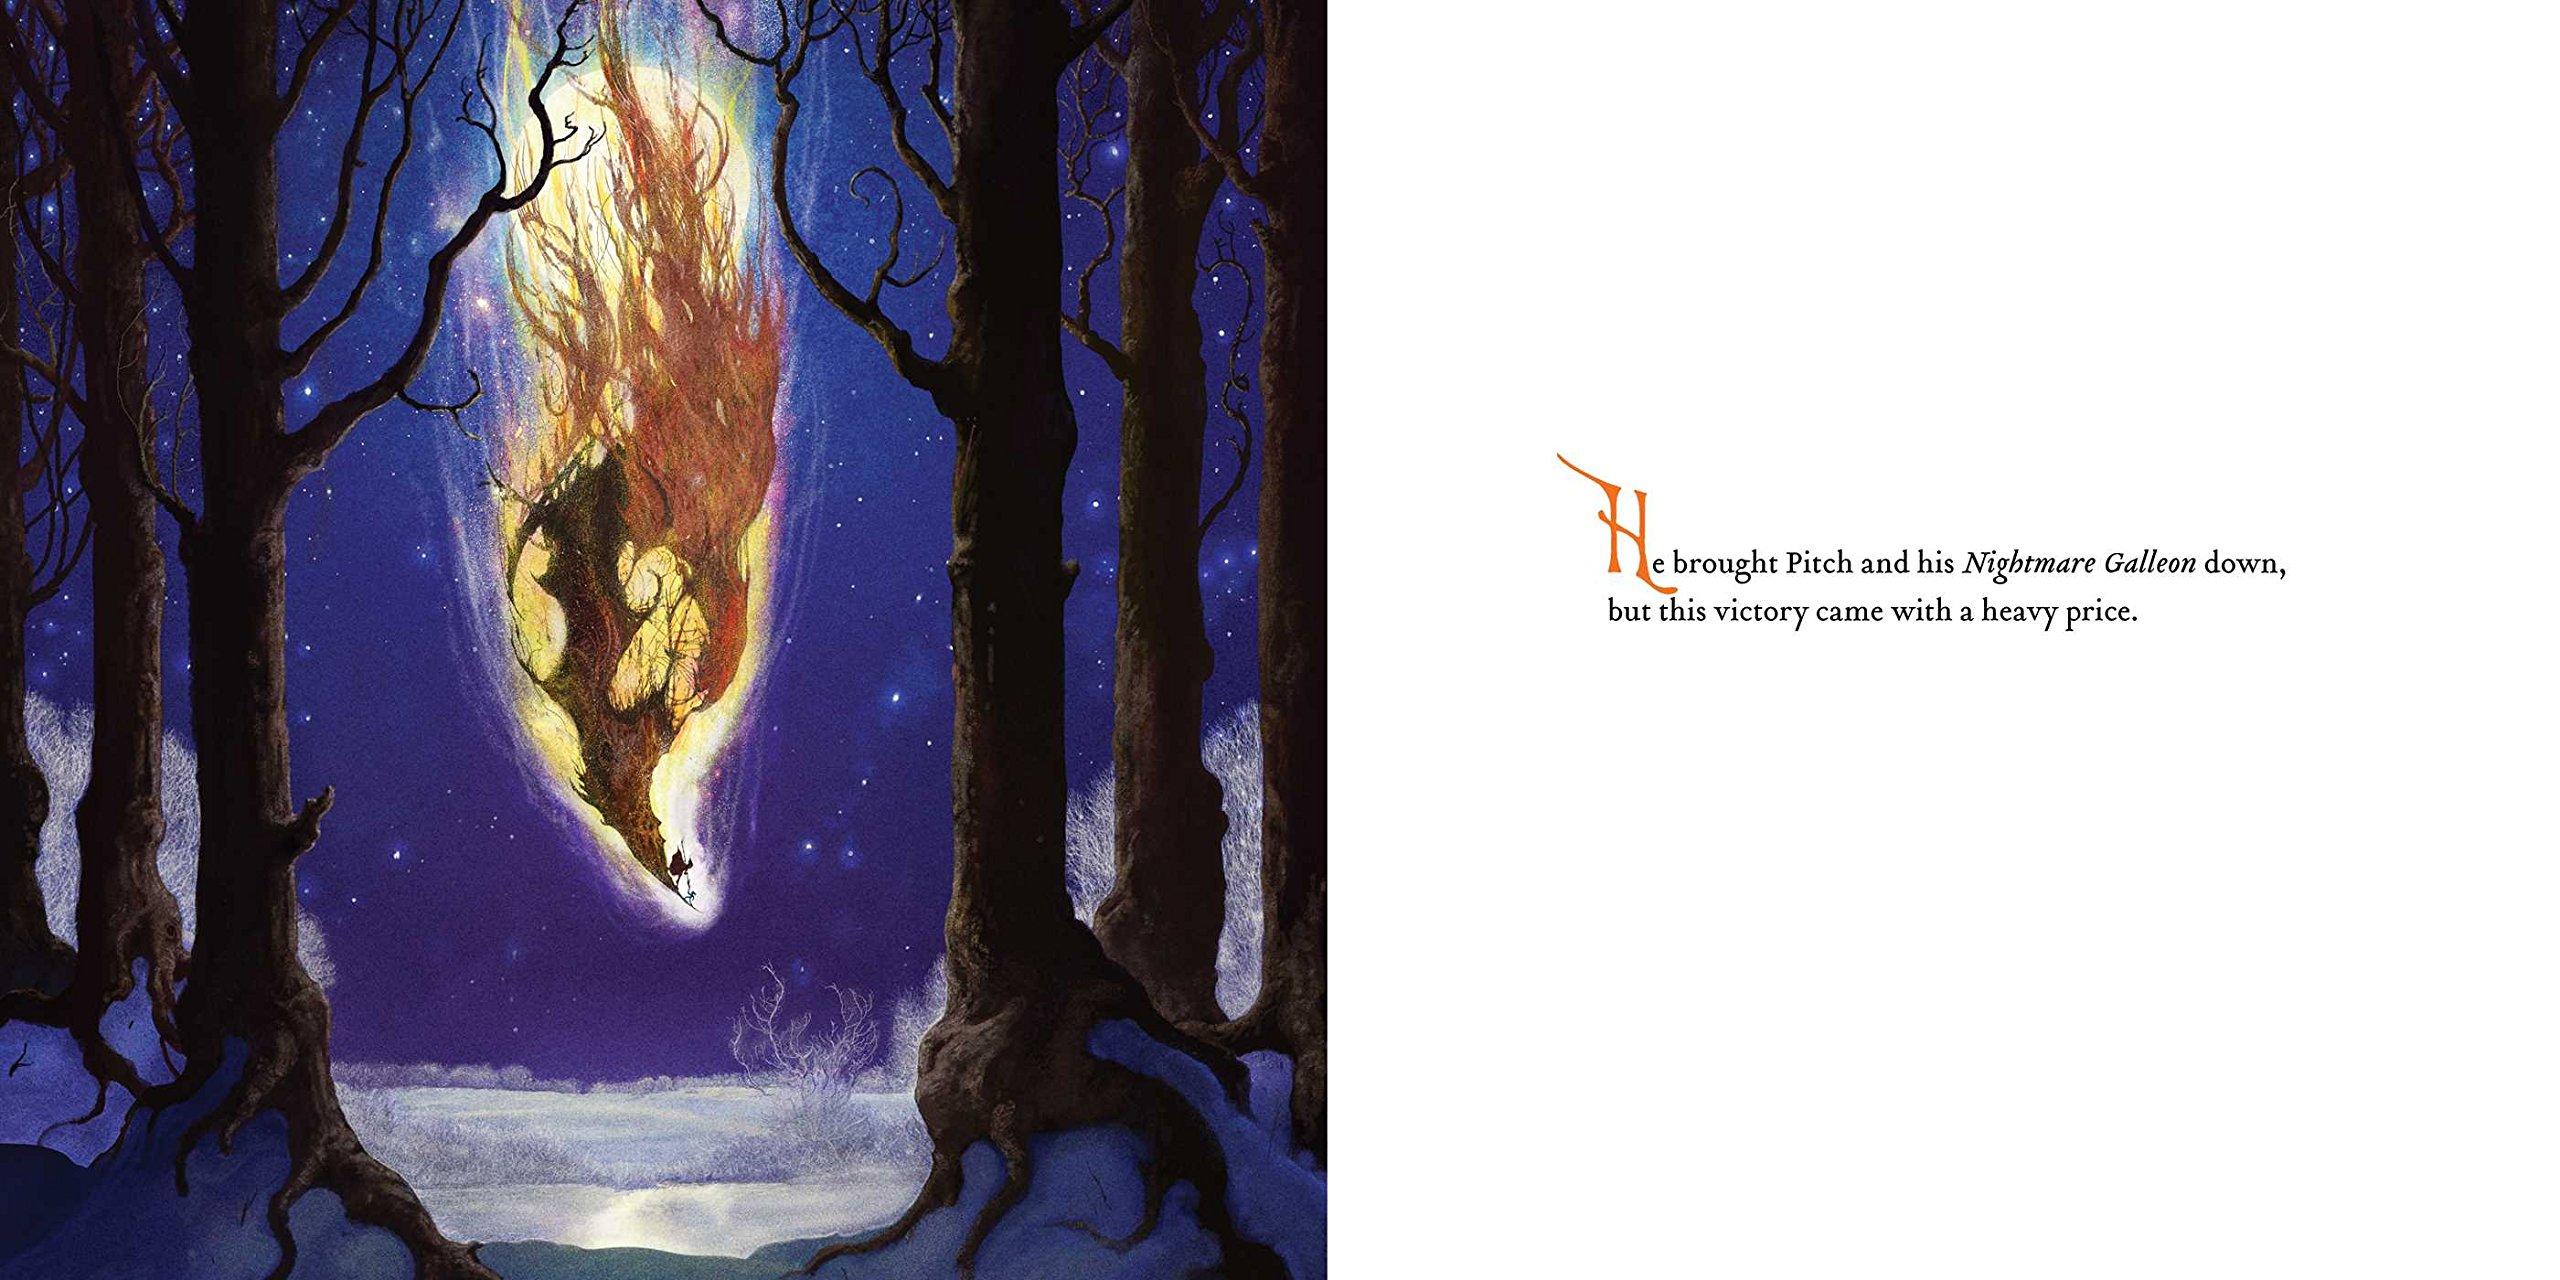 Night light x jack frost - Jack Frost The Guardians Of Childhood William Joyce 9781442430433 Amazon Com Books